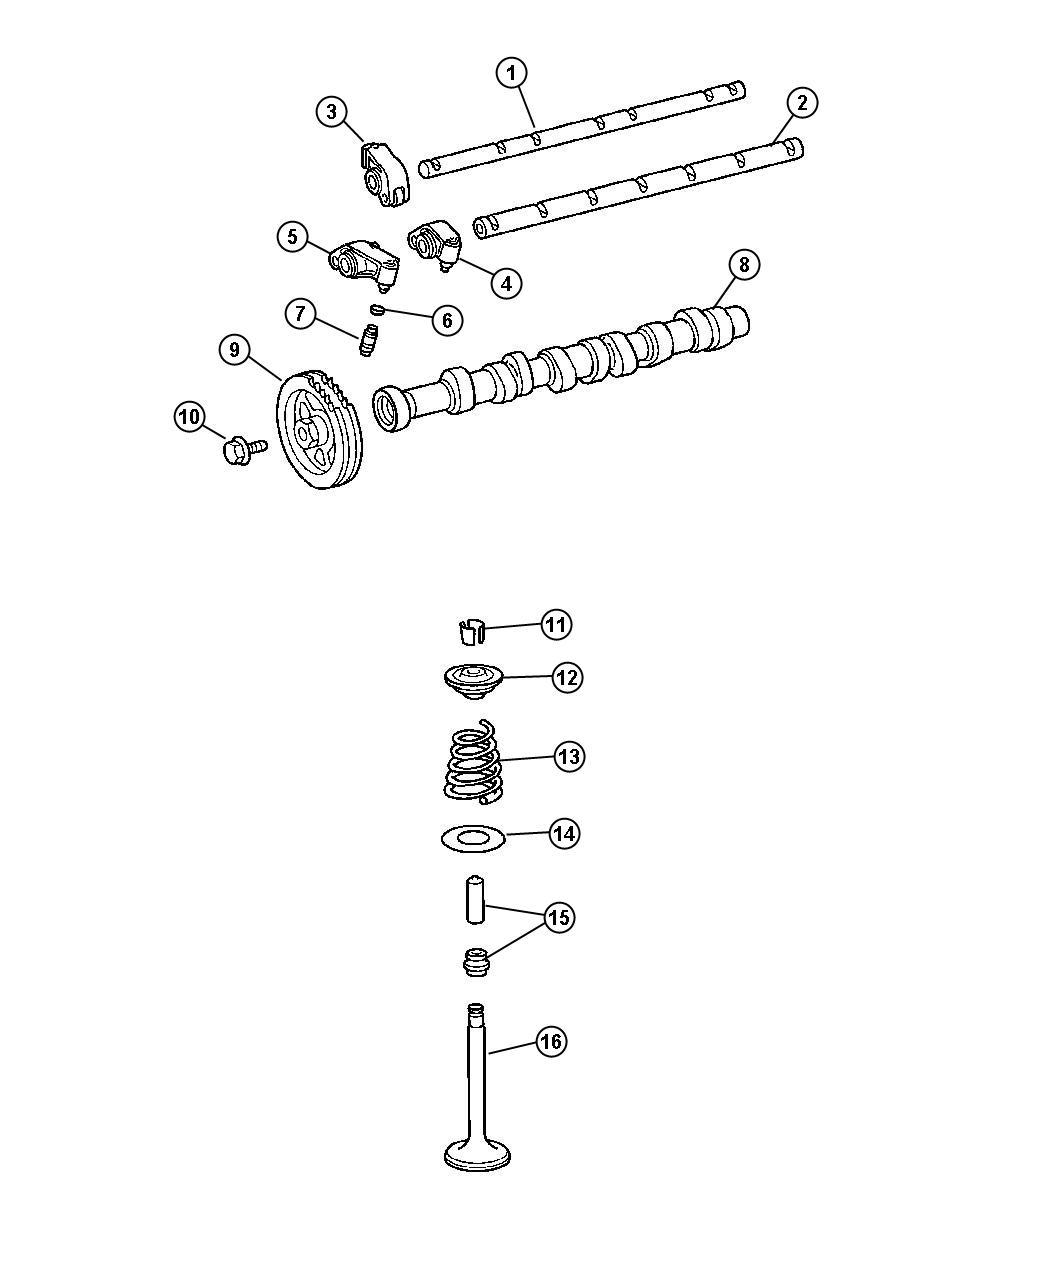 Chrysler Crossfire Shaft  Rocker Arm  Exhaust  Camshaft